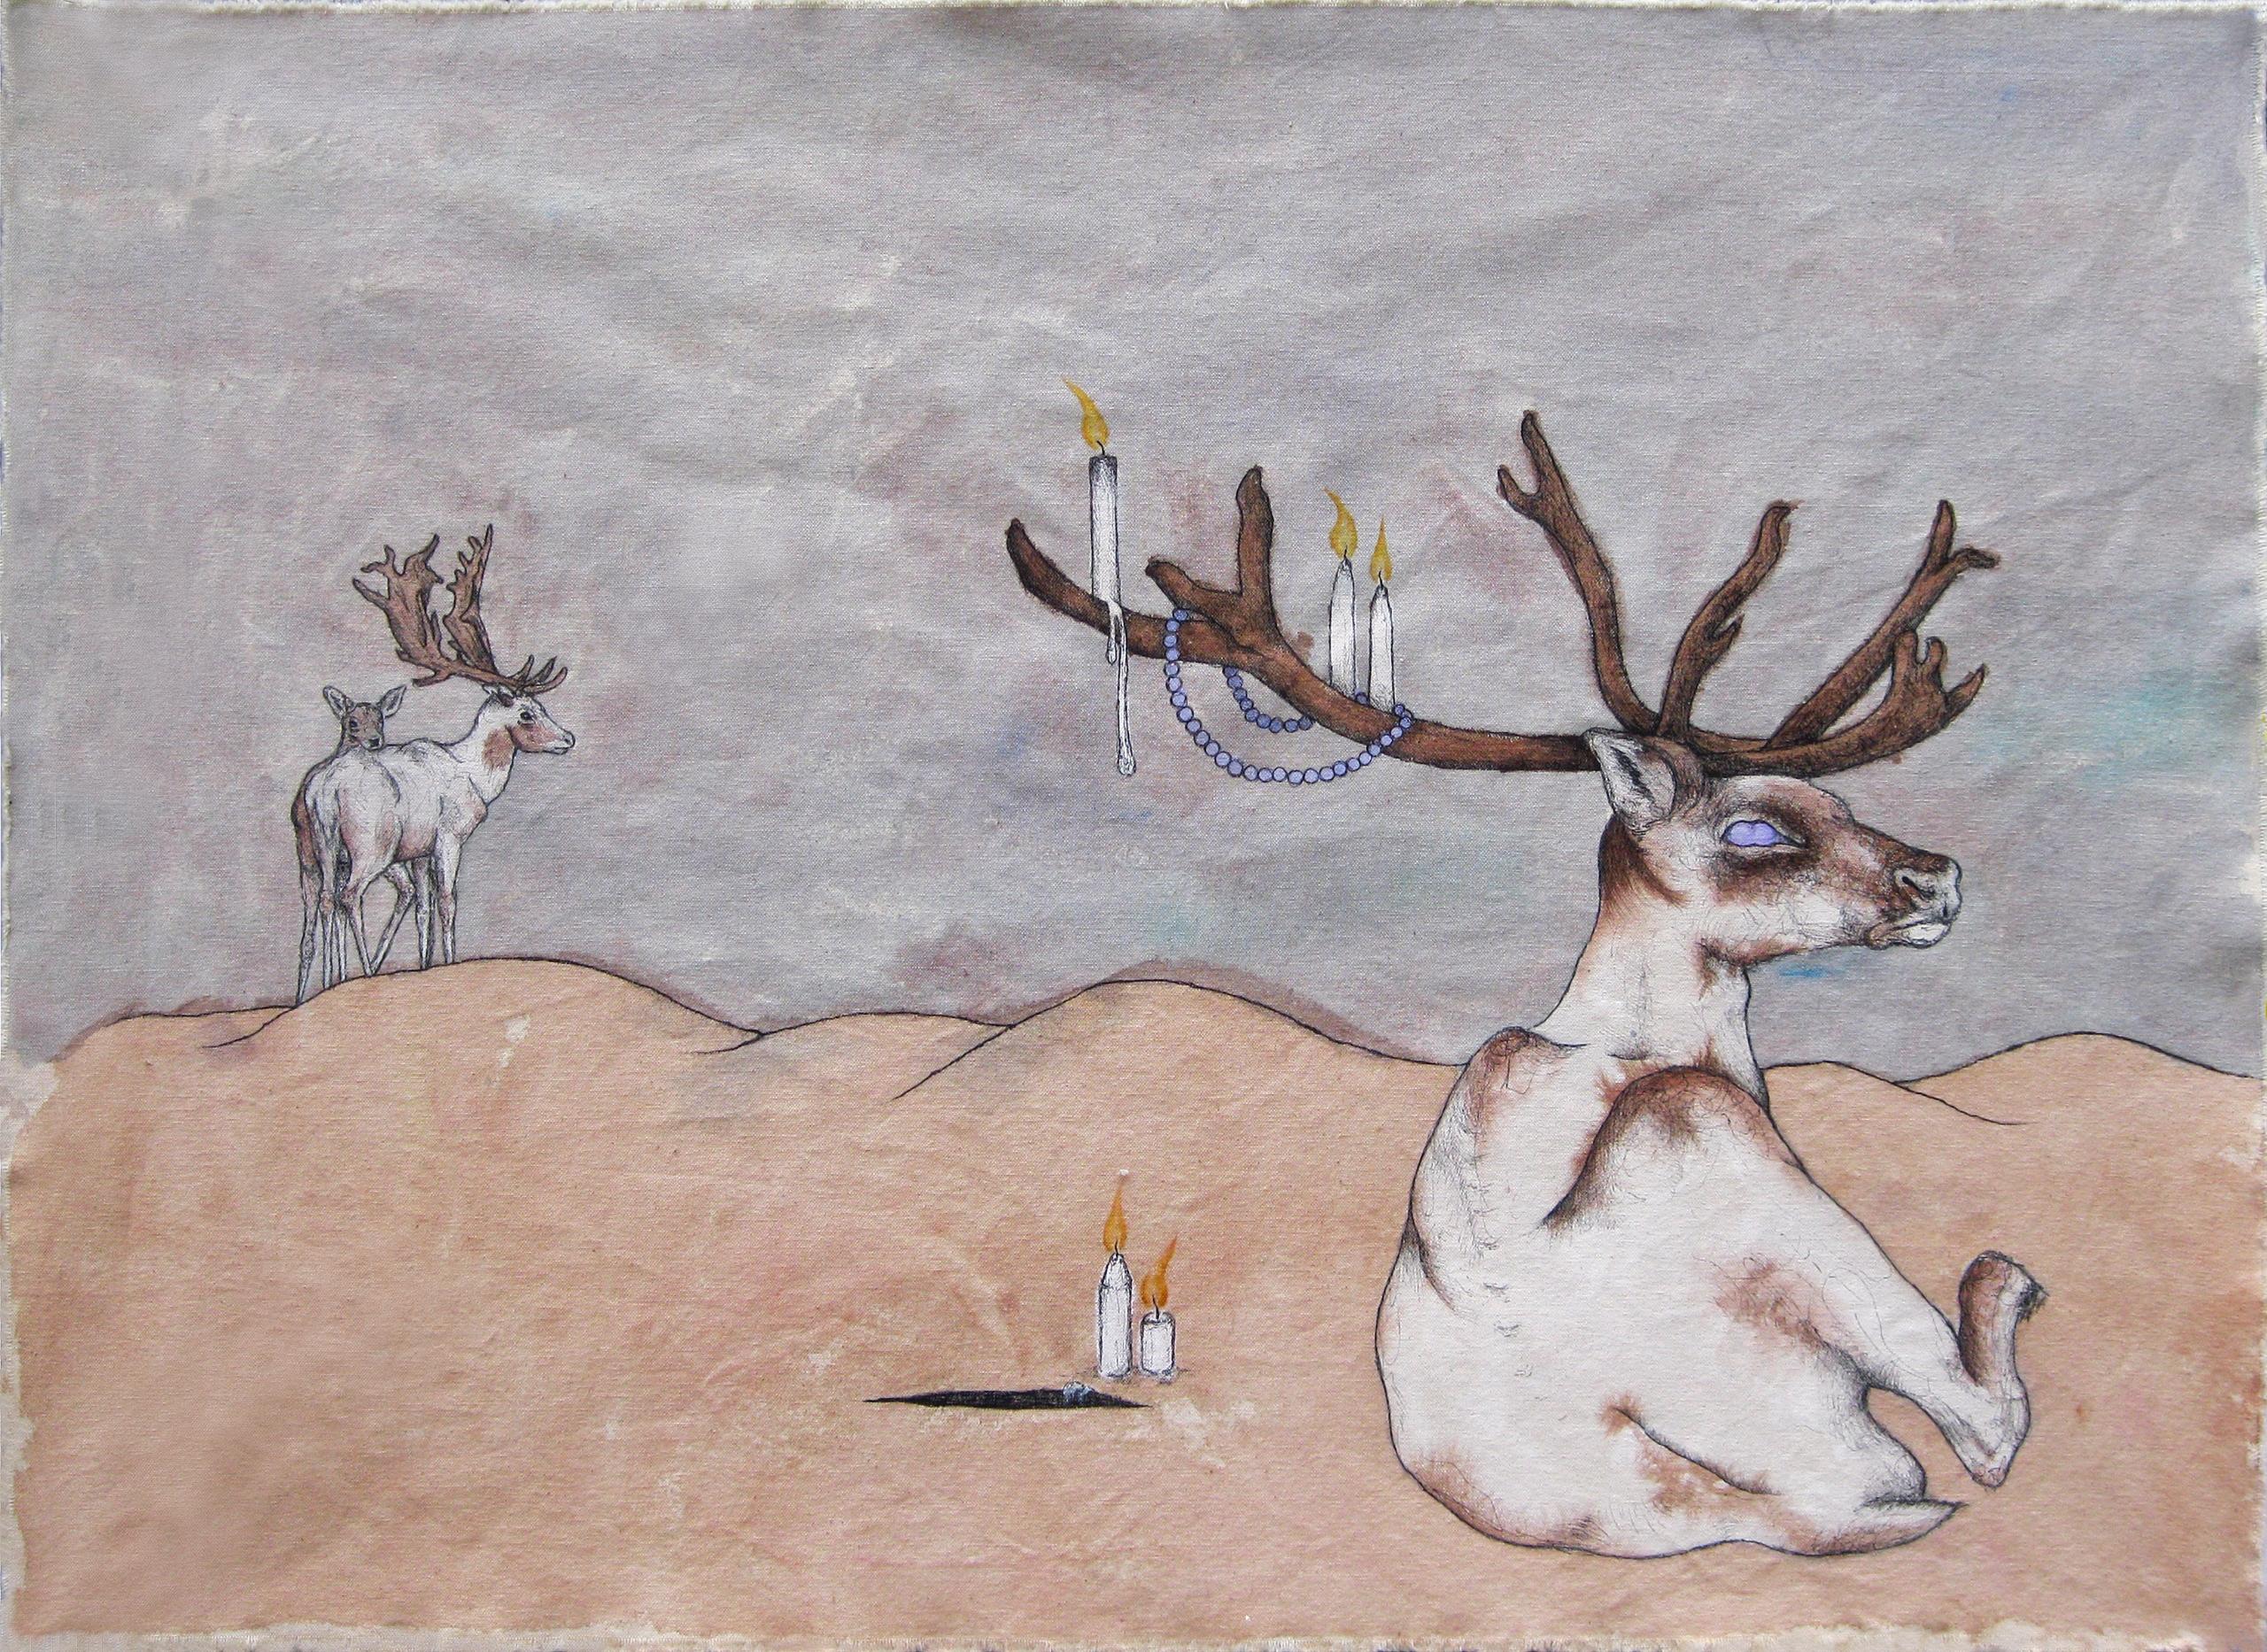 Pilgrimage Afraid watercolor, a - hannahward | ello